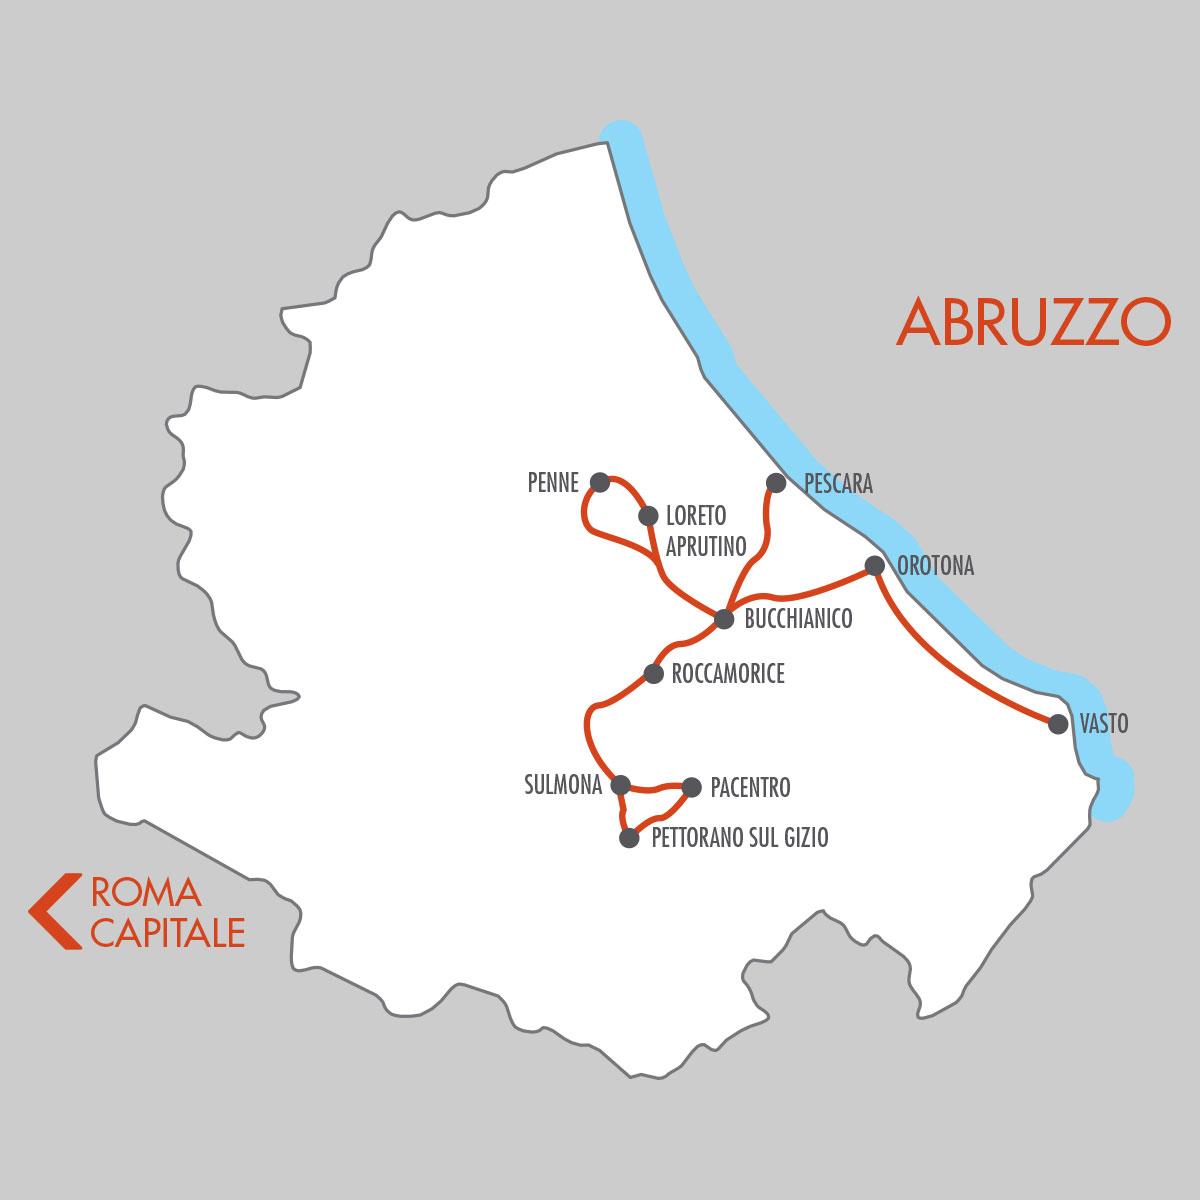 Abruzzo 5 Day Tour Map